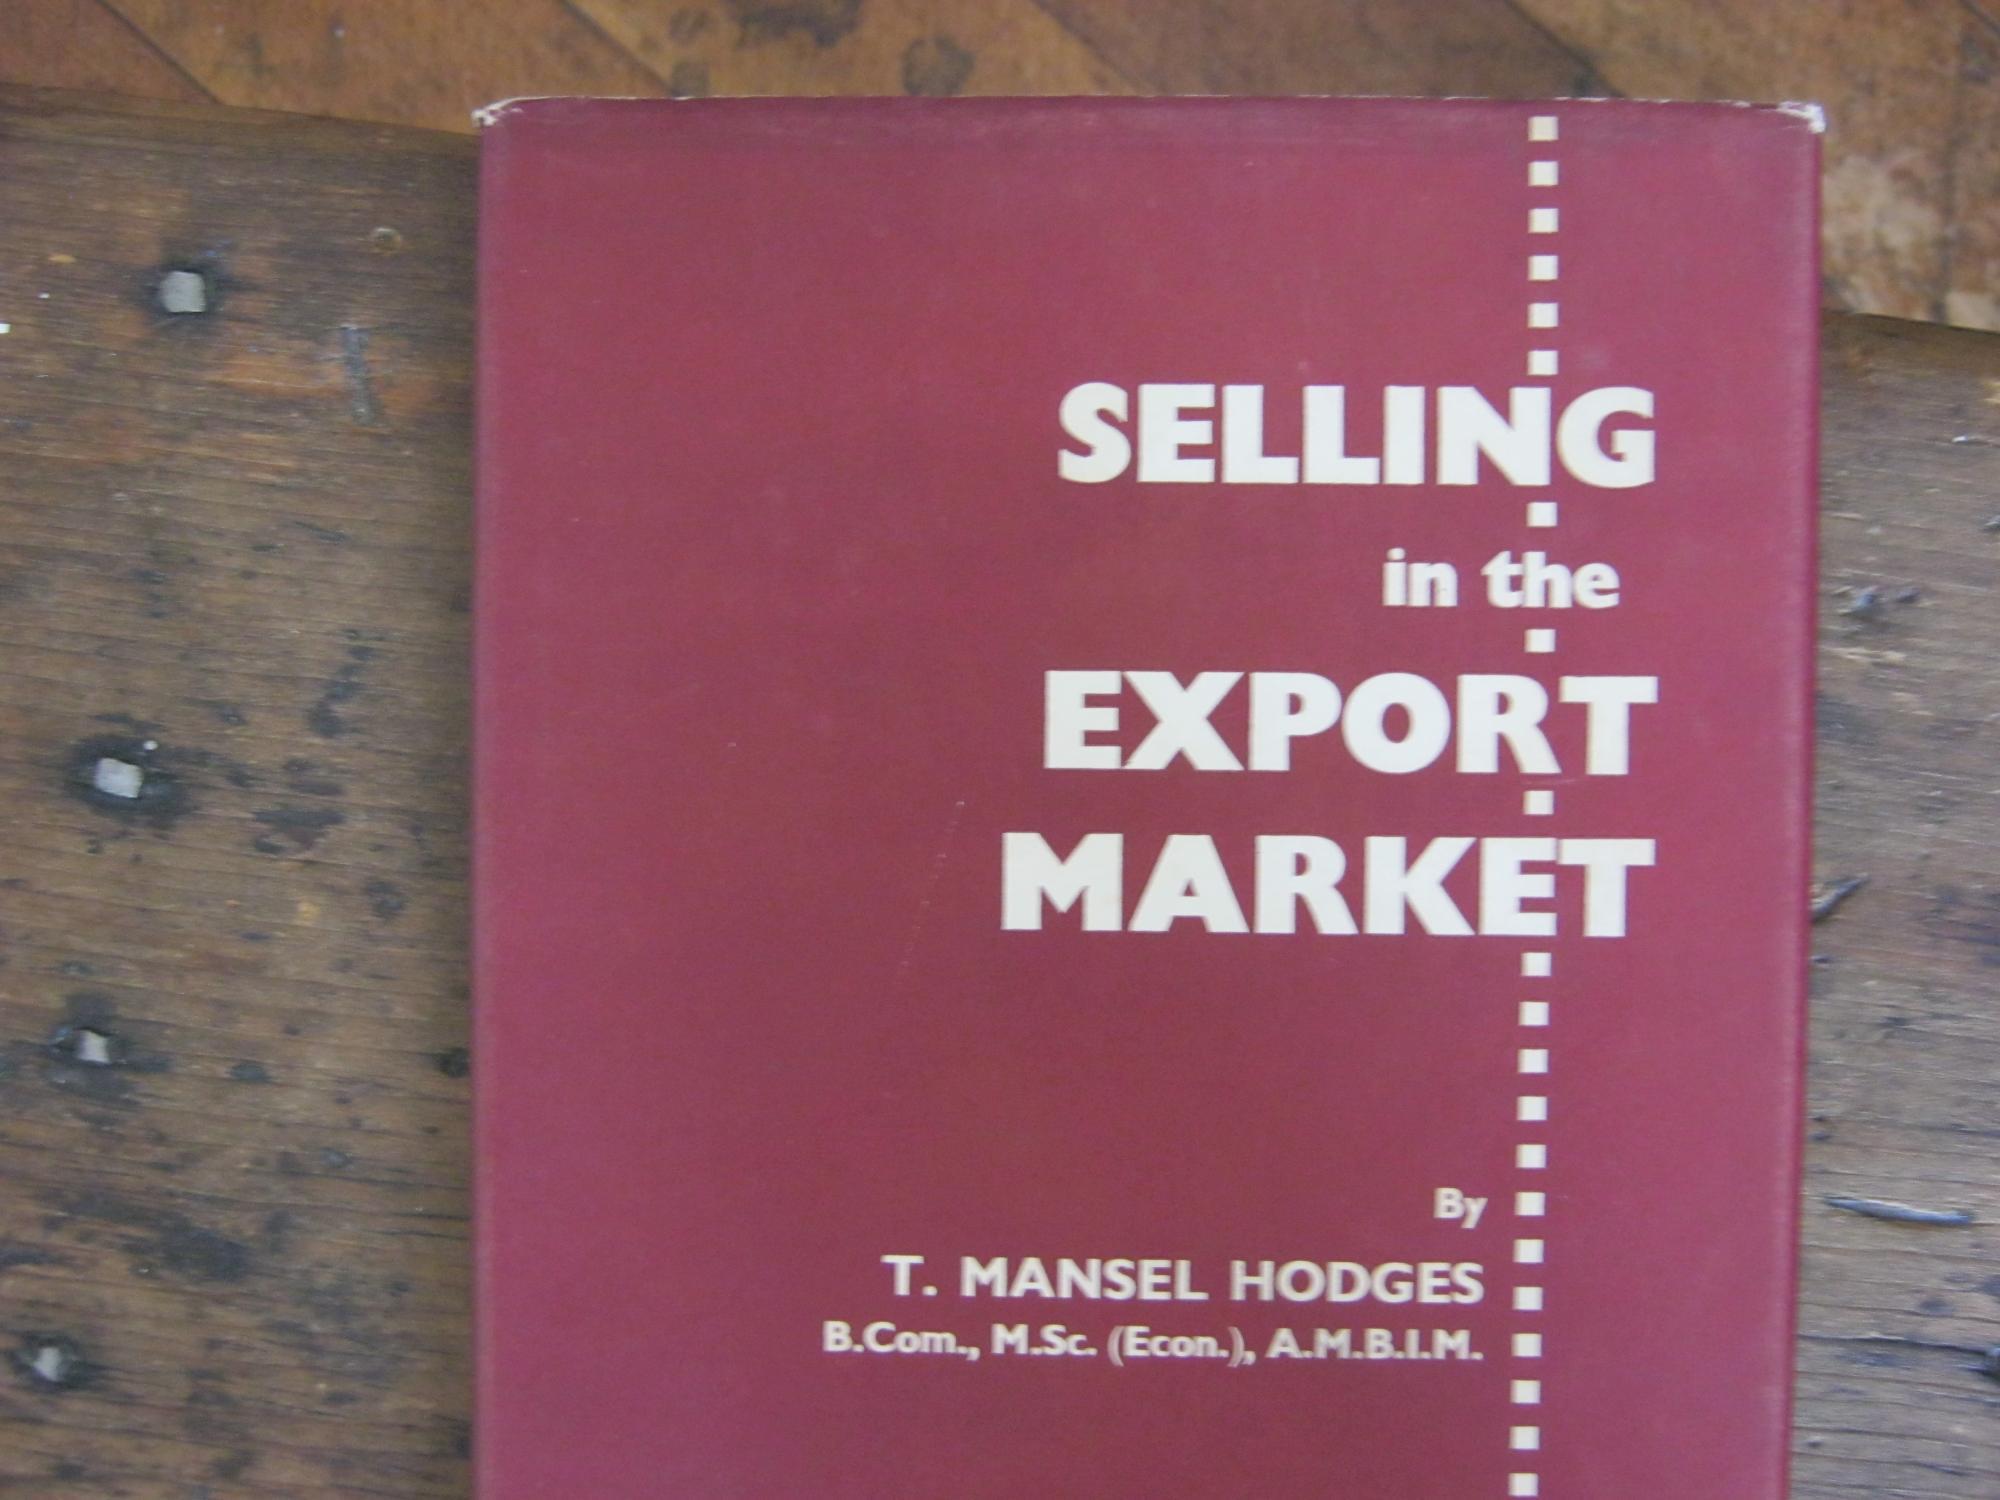 Selling_in_the_Export_Market_Hodges_T_Mansel_Bon_Couverture_rigide